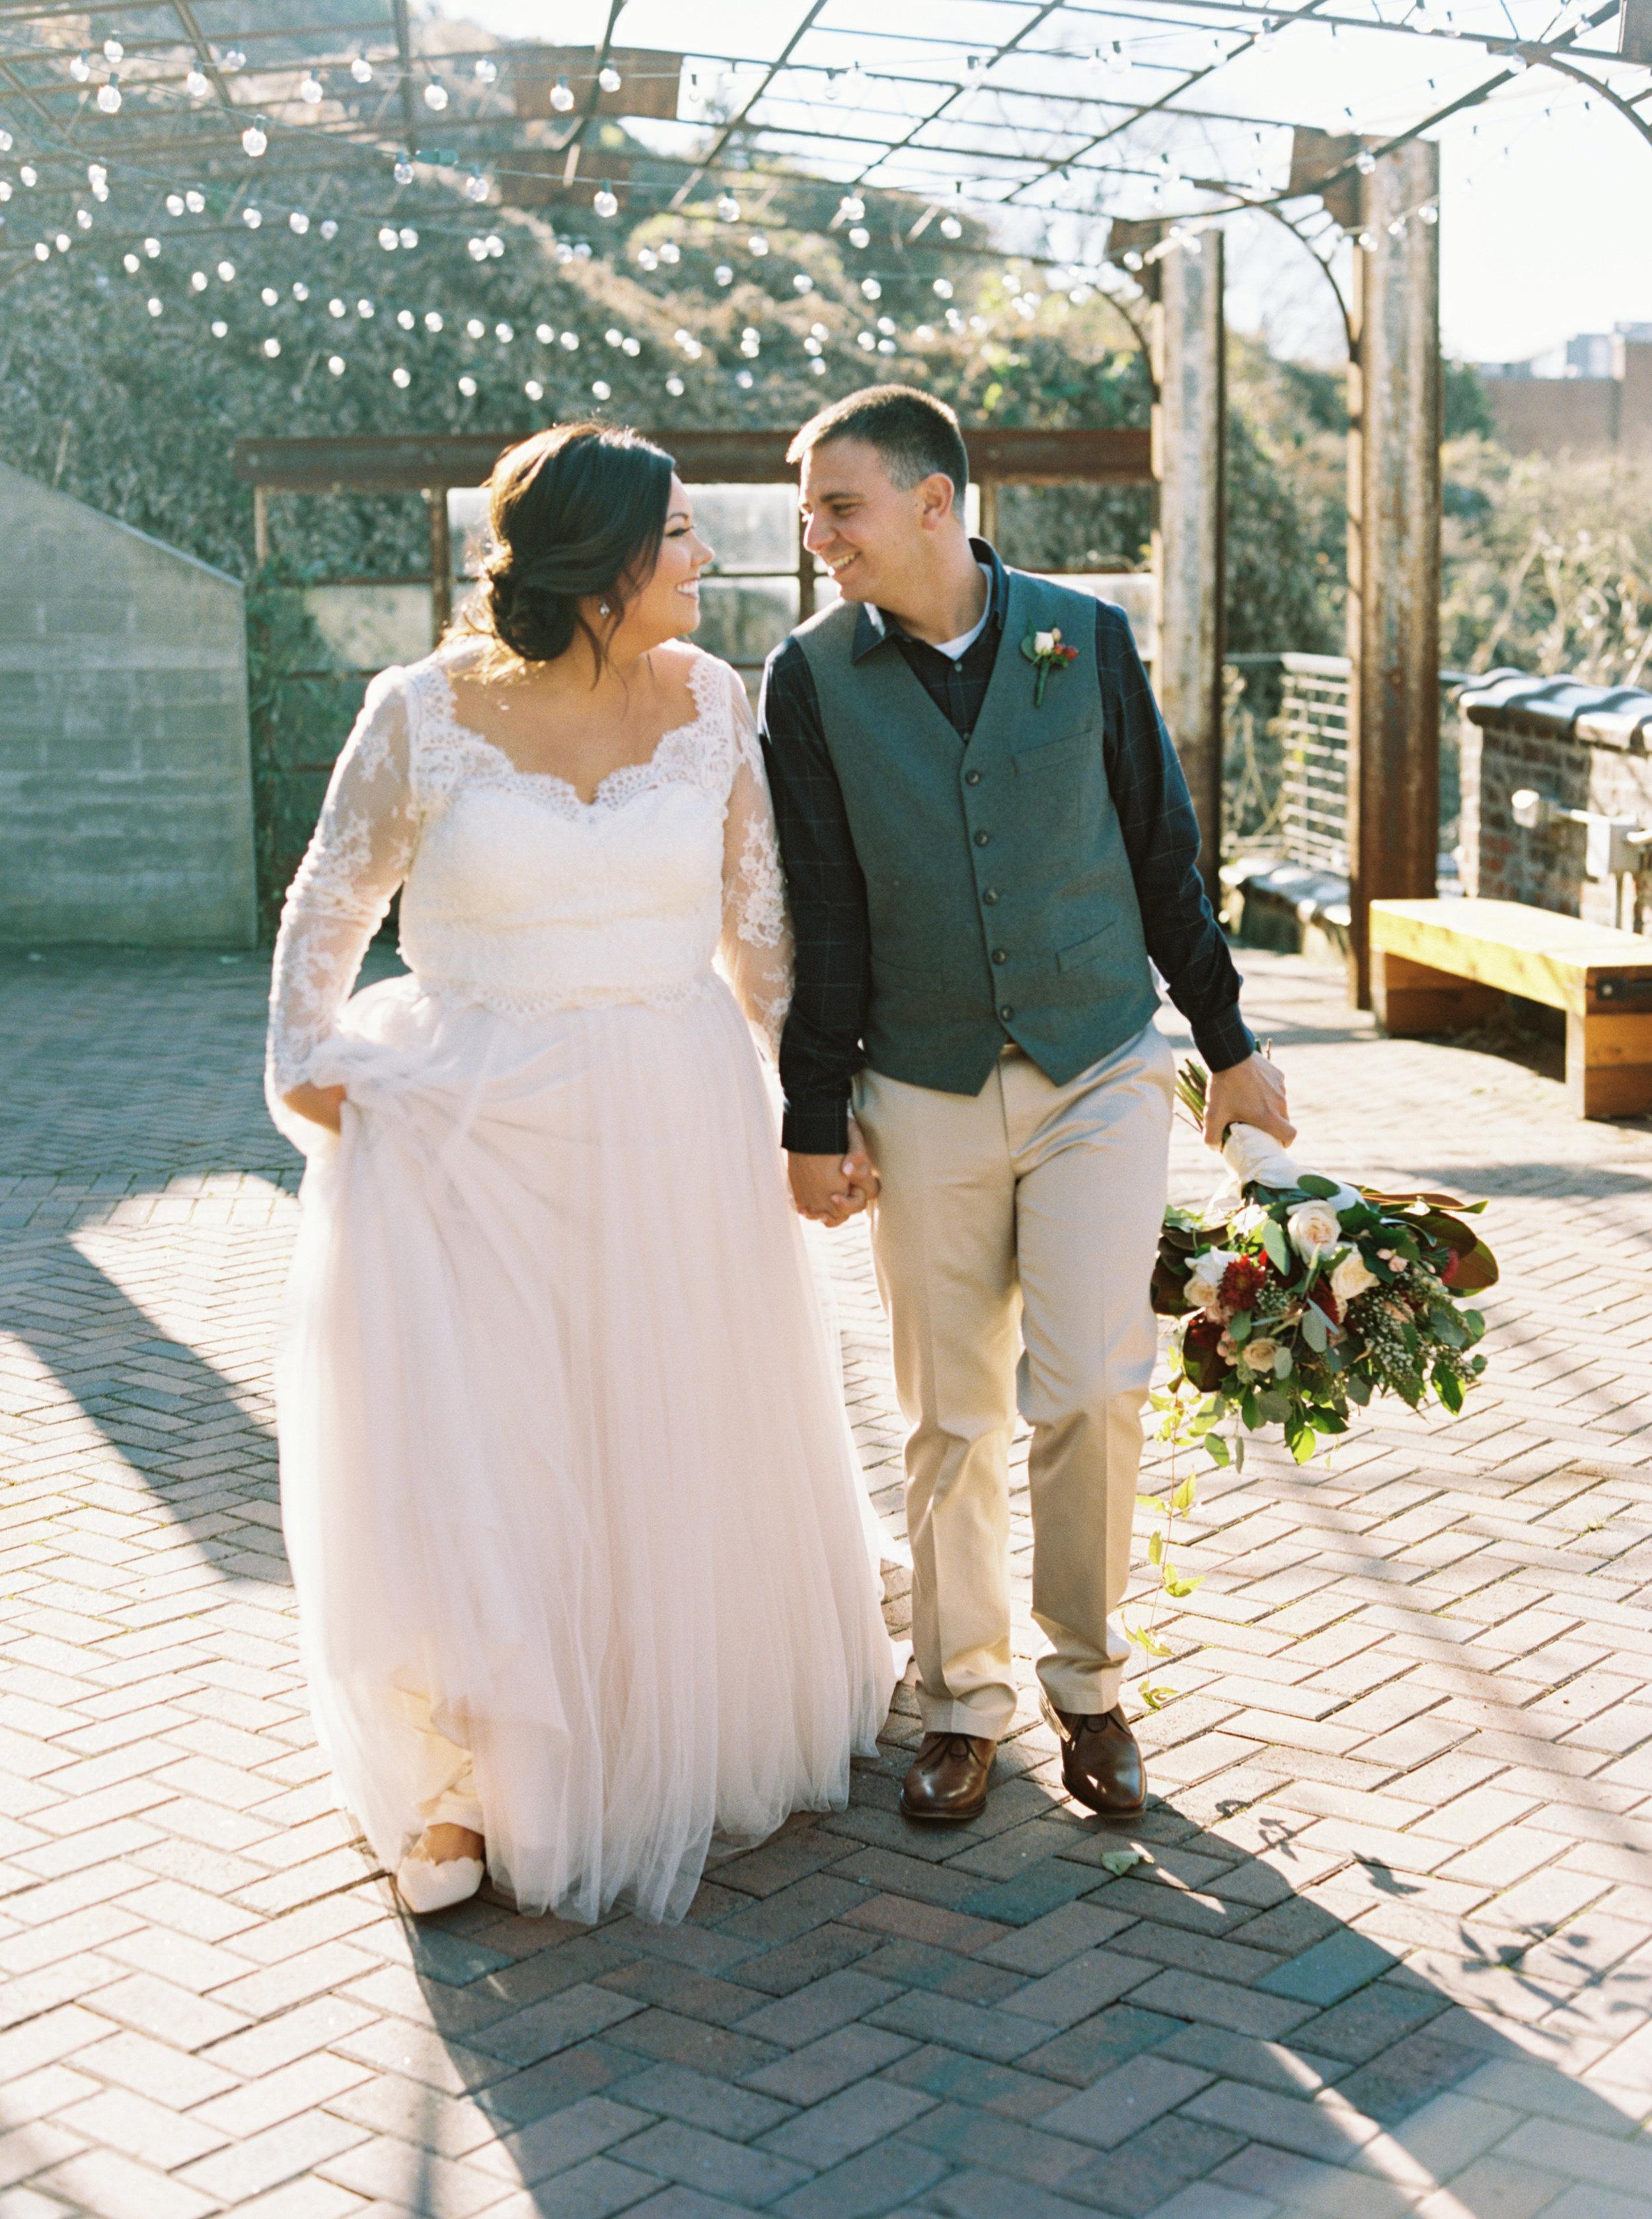 Lauren_Jeremy_Standard_Wedding_Knoxville_Abigail_Malone_Photography_FIlm-187.jpg